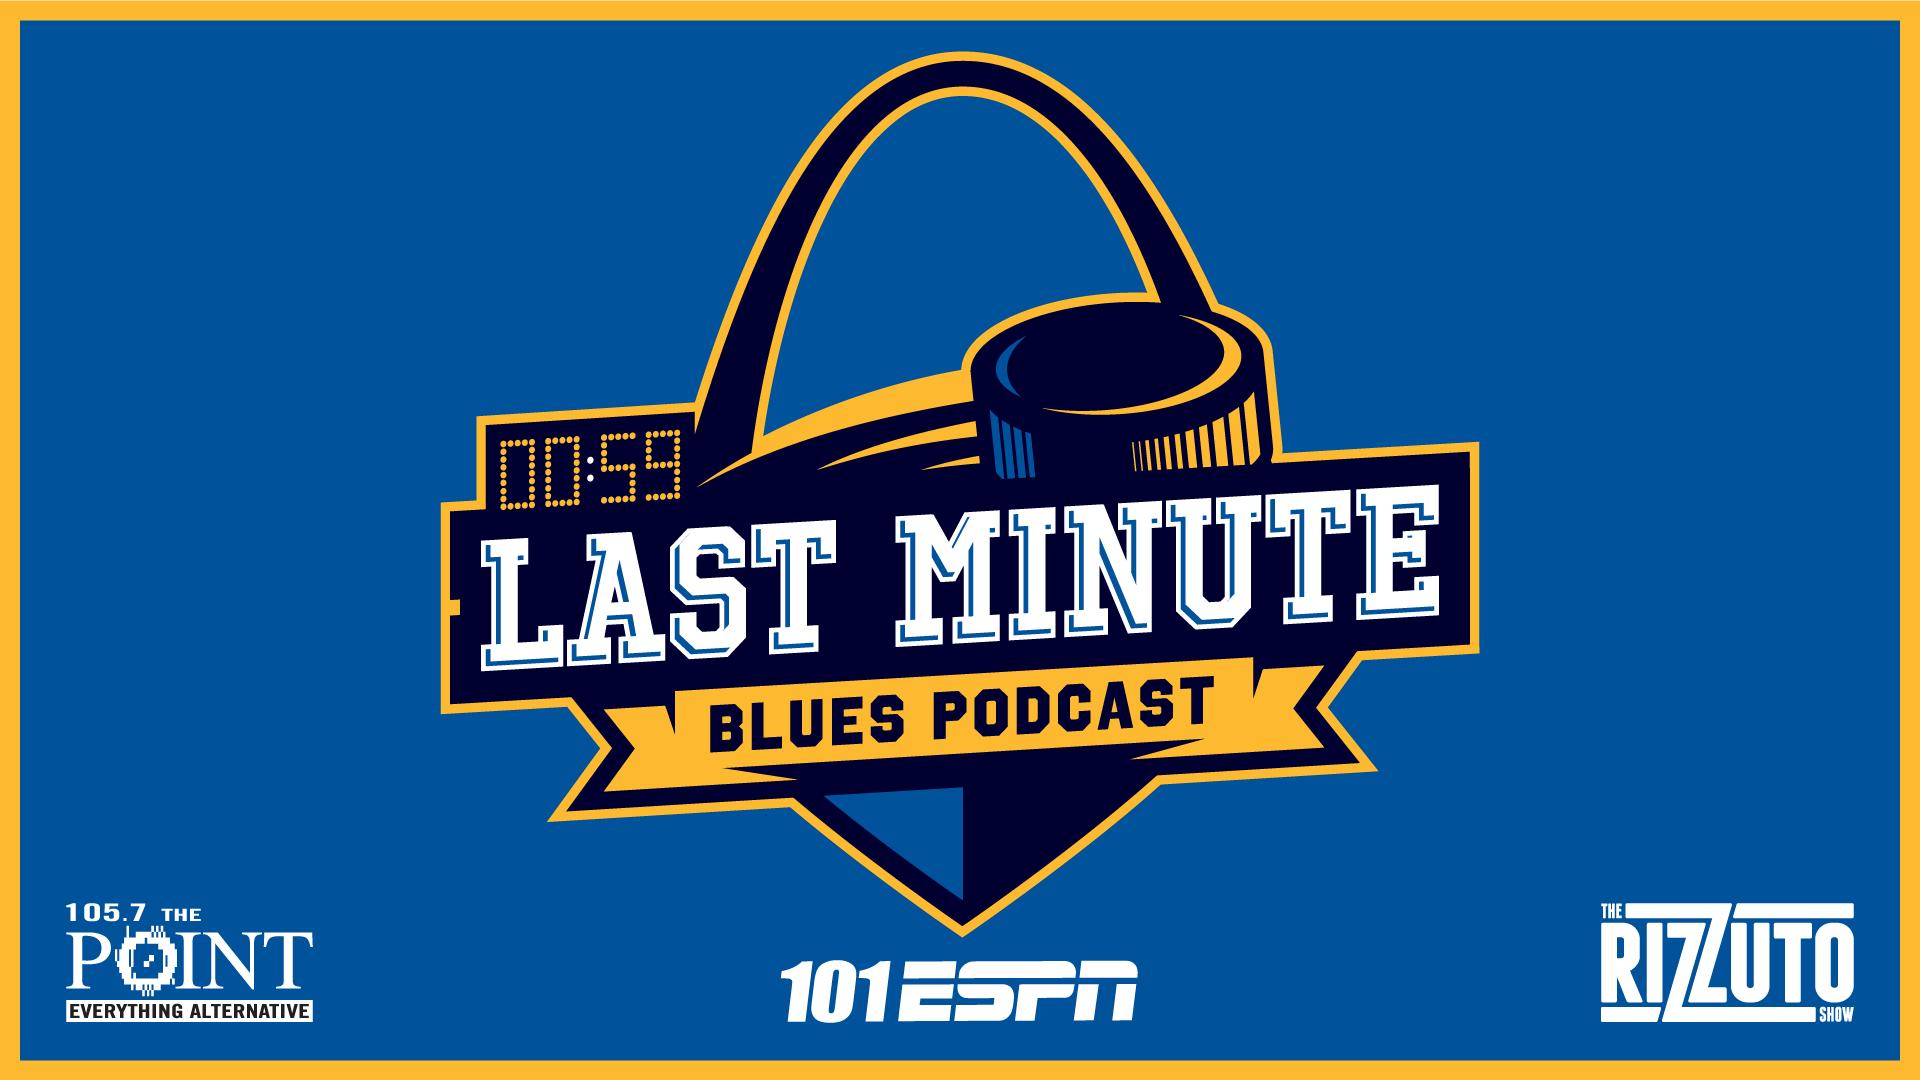 Last_Minute_Blues_Podcast_1920x1080_01